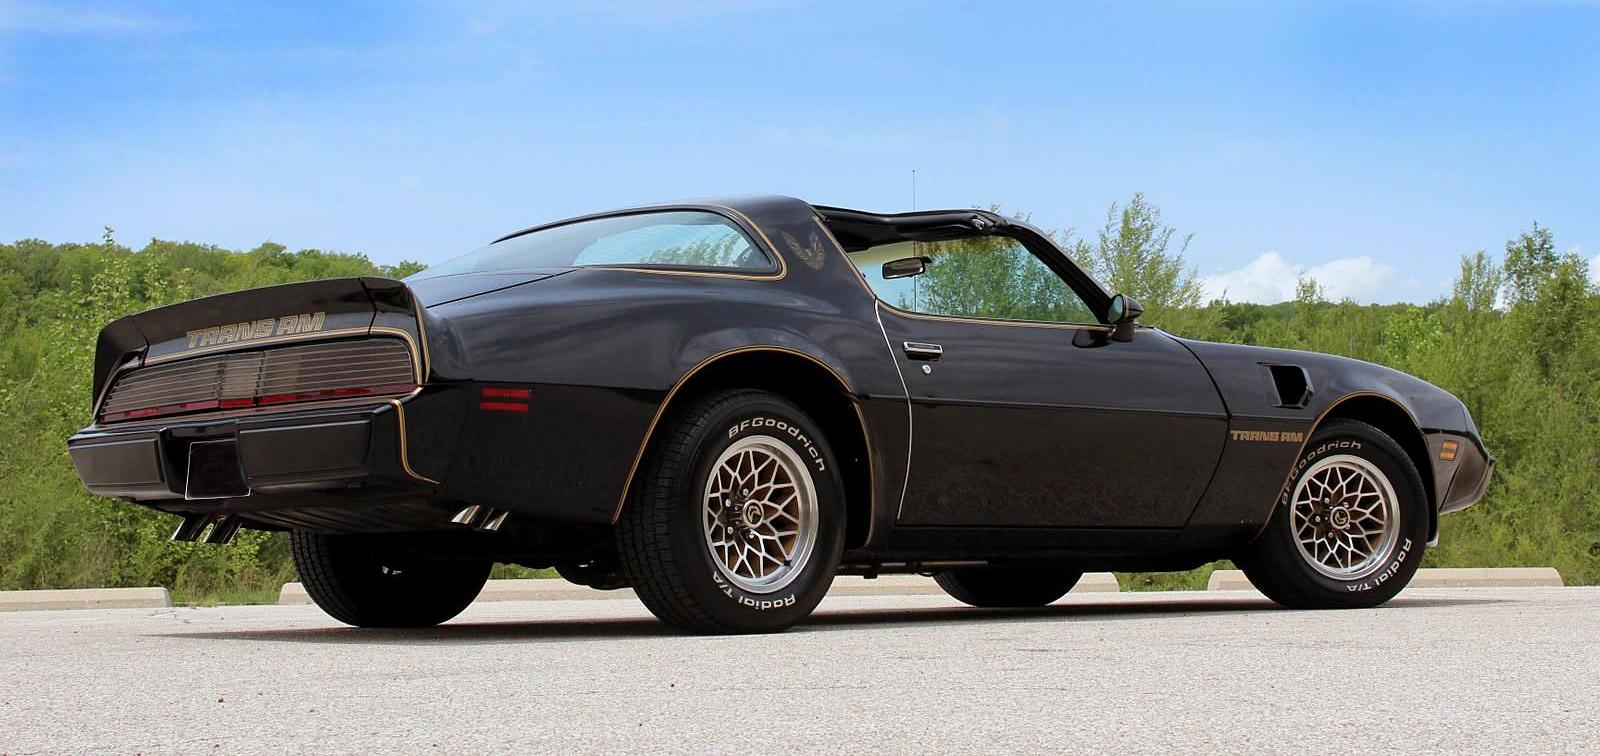 1979 pontiac trans am muscle car. Black Bedroom Furniture Sets. Home Design Ideas